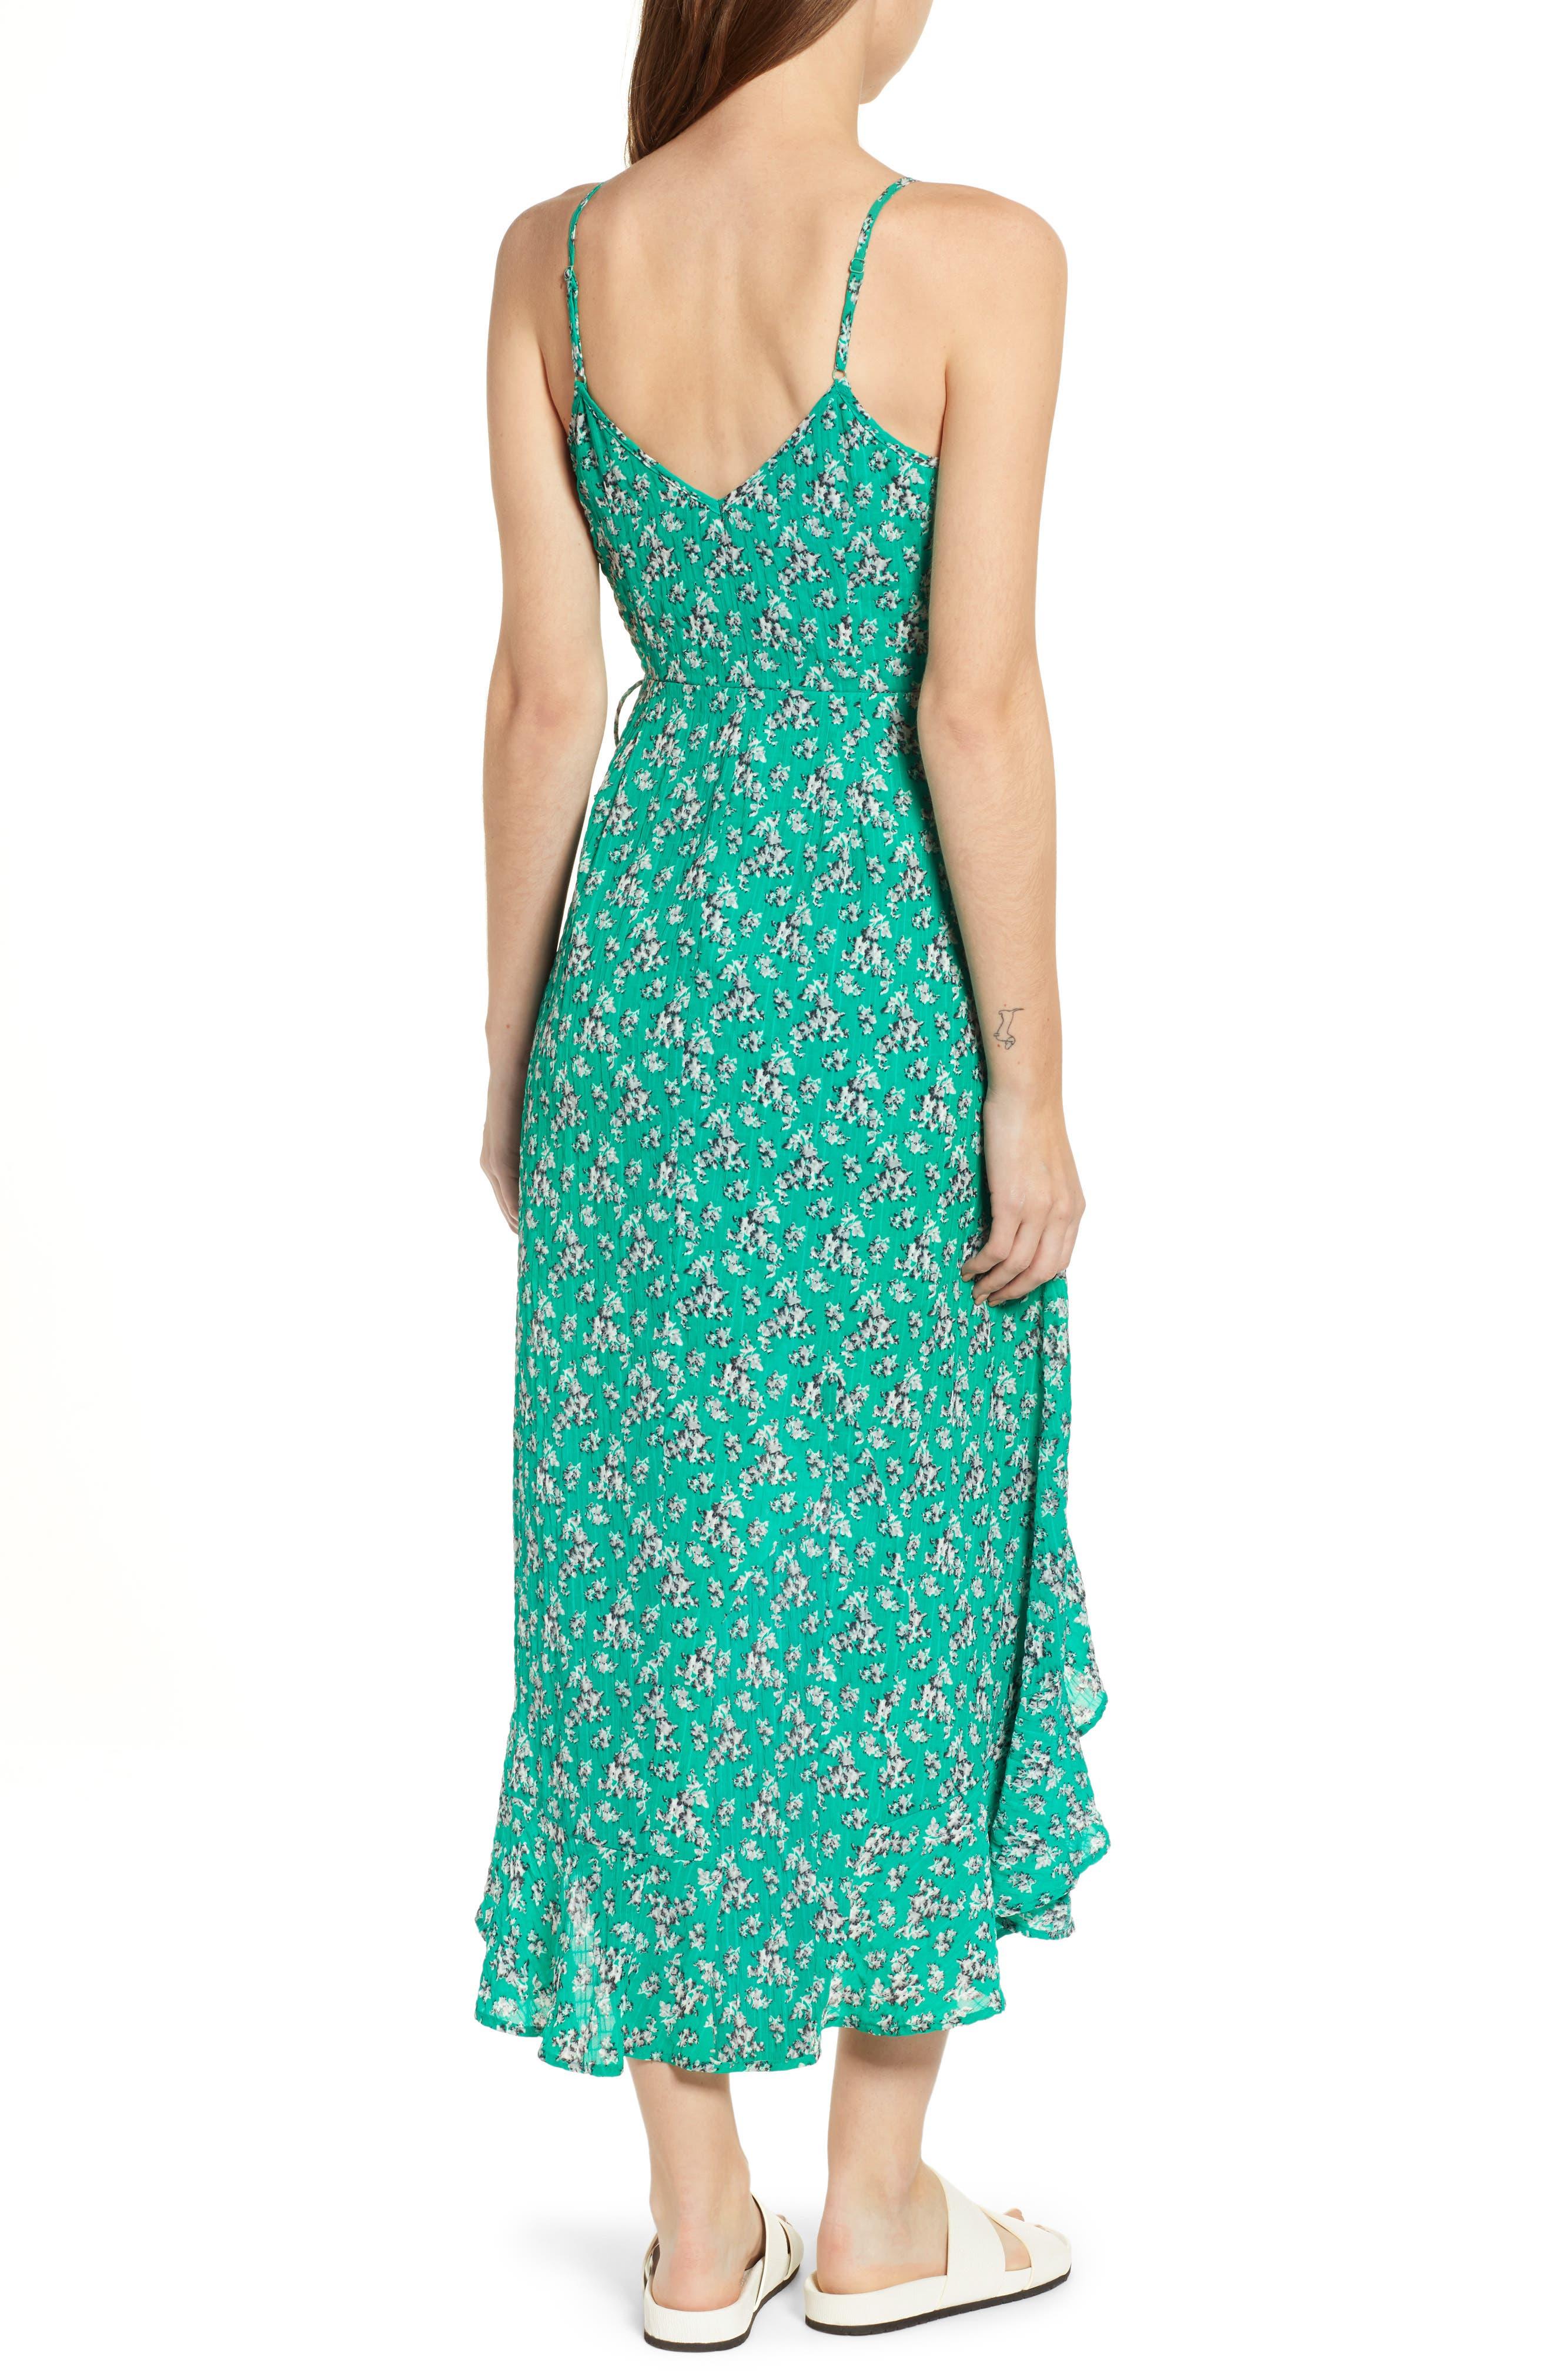 Adventurer Floral Print High/Low Dress,                             Alternate thumbnail 2, color,                             GREEN FLORAL